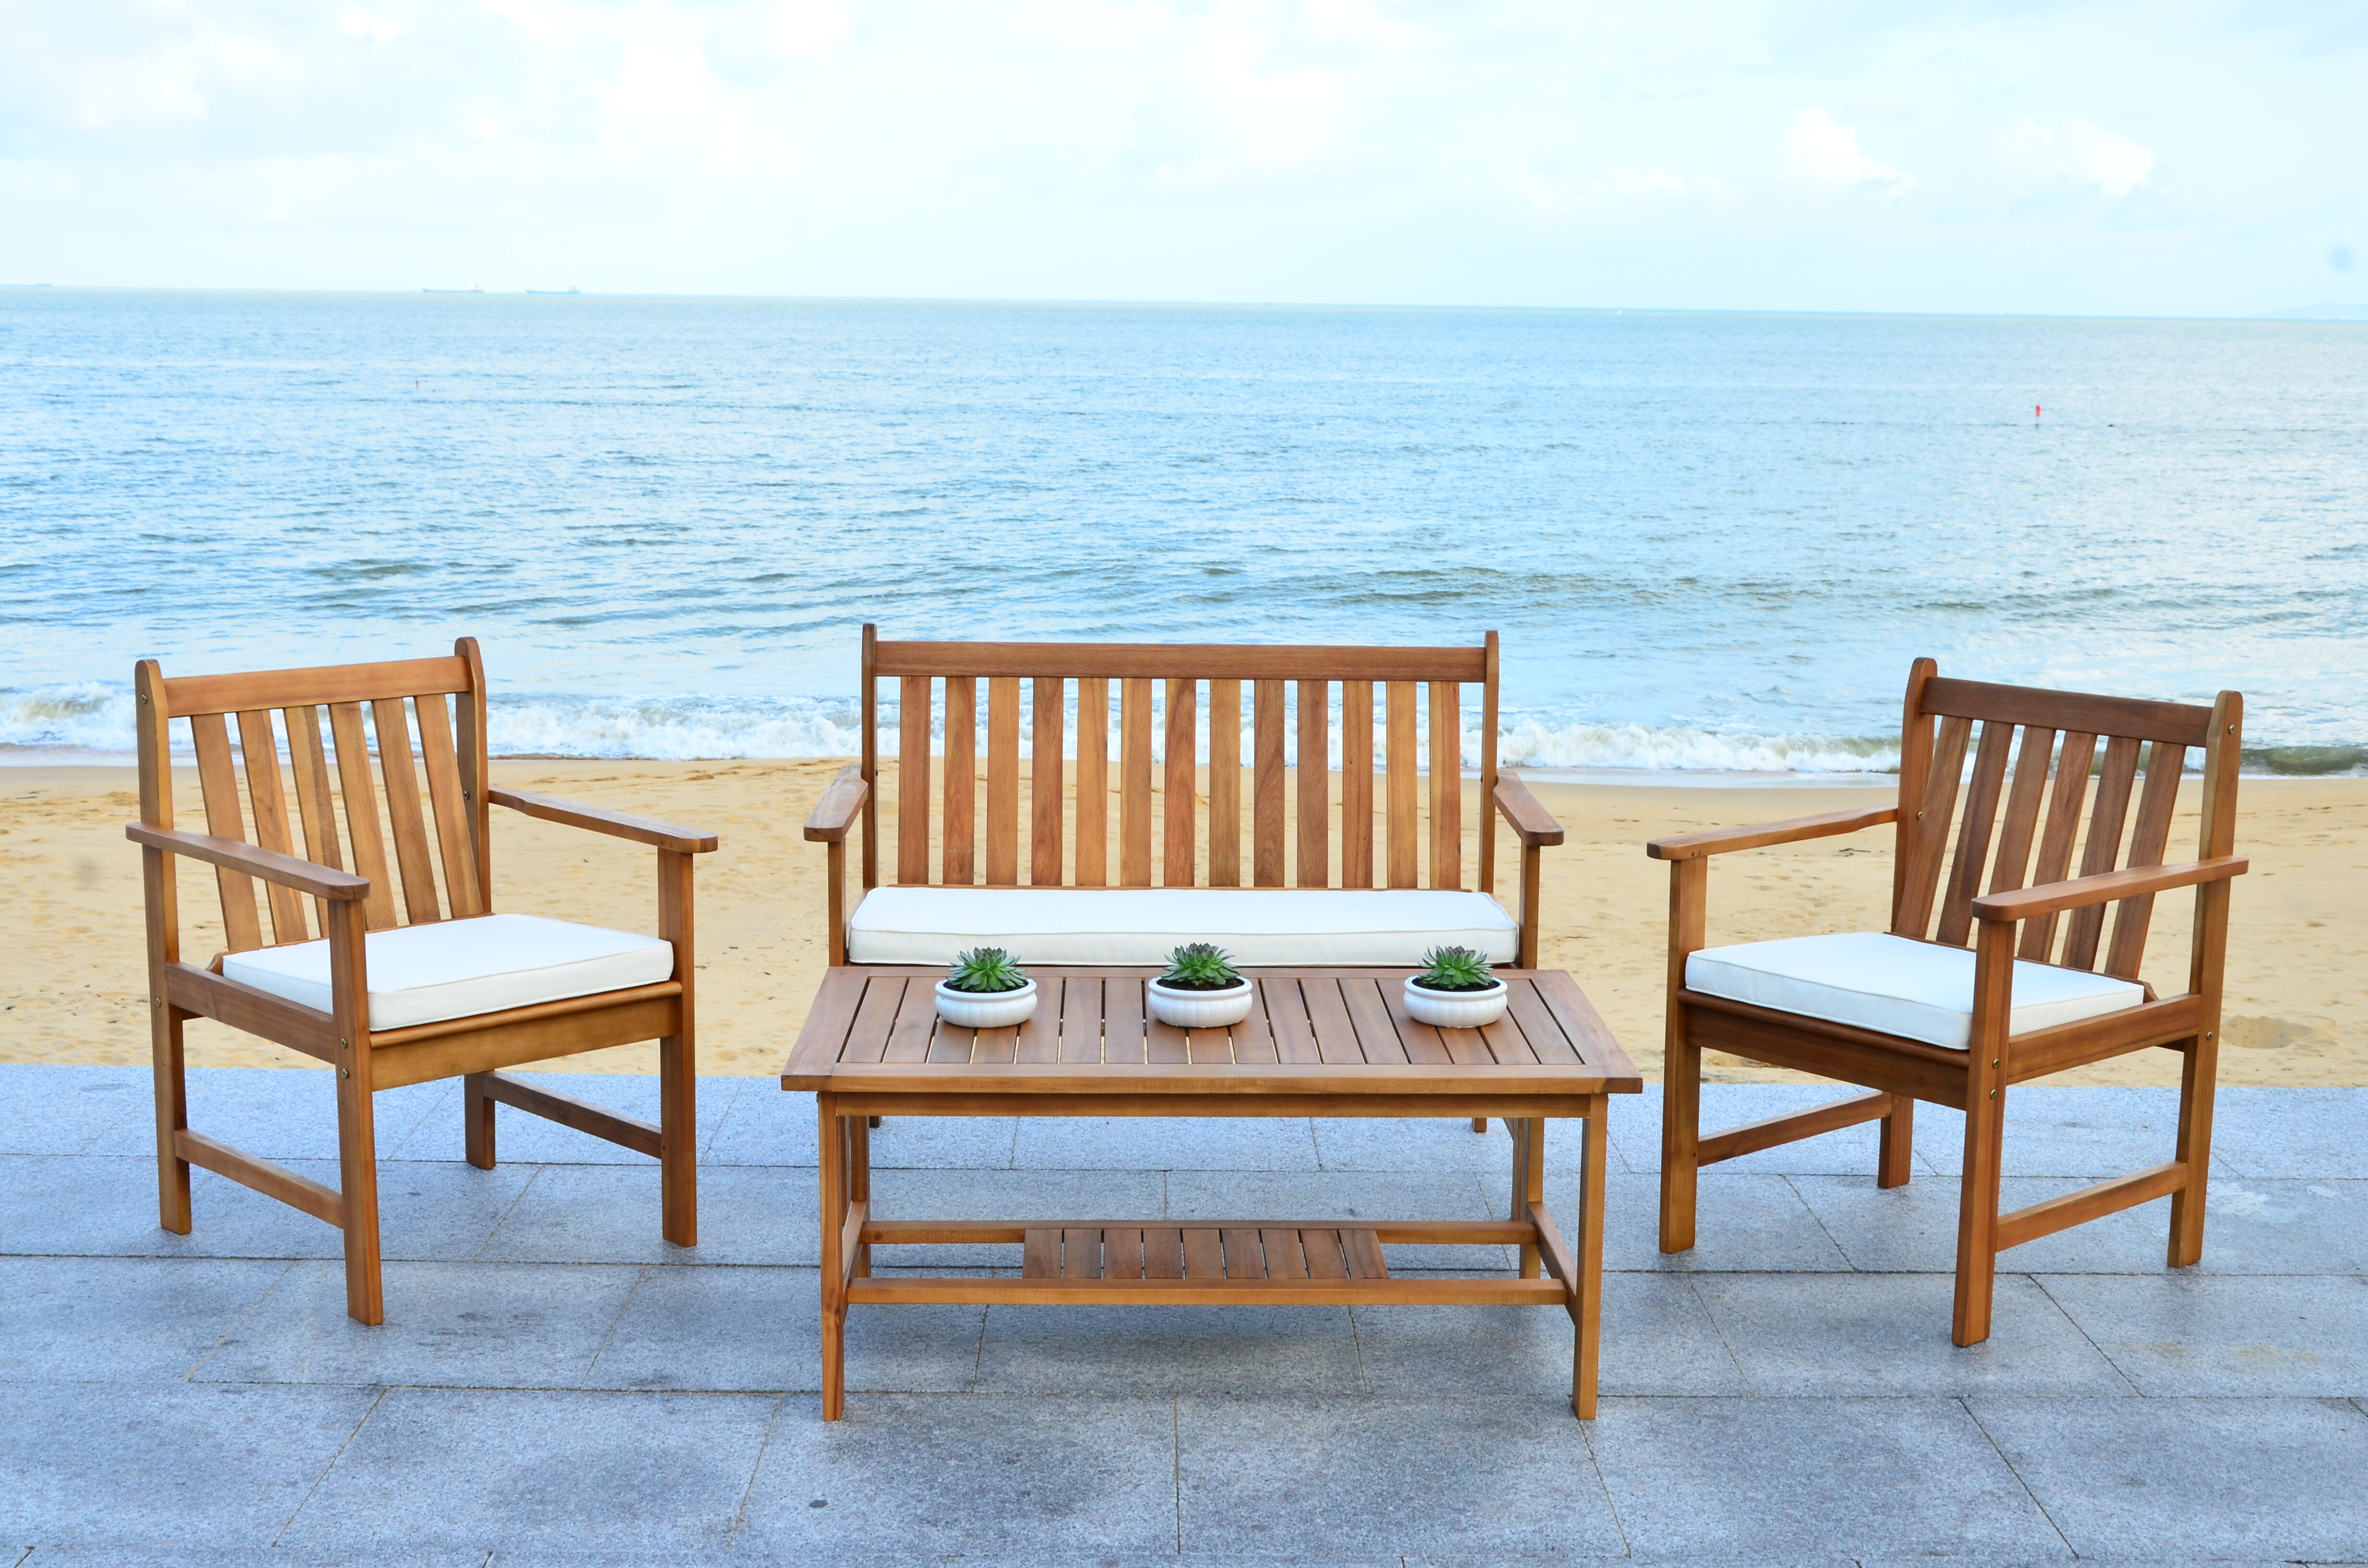 Astonishing Joliet 4 Piece Loveseat Seating Group With Cushions Spiritservingveterans Wood Chair Design Ideas Spiritservingveteransorg